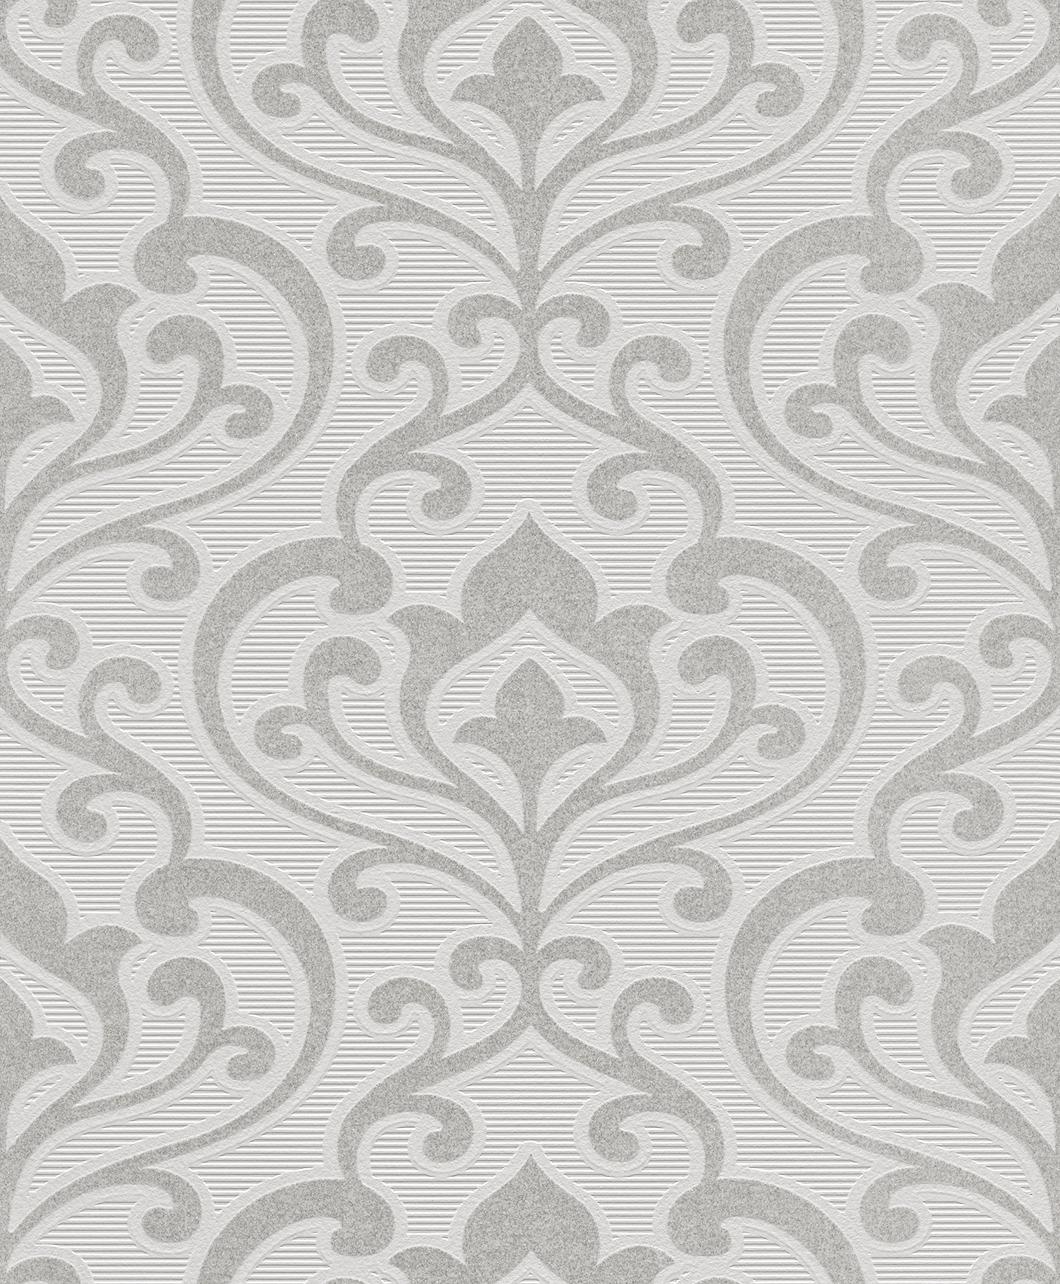 Tapete weiß ornamente  Rasch Tapete Queen - 795004 Ornamente Barock weiß silber Vlies (1 ...